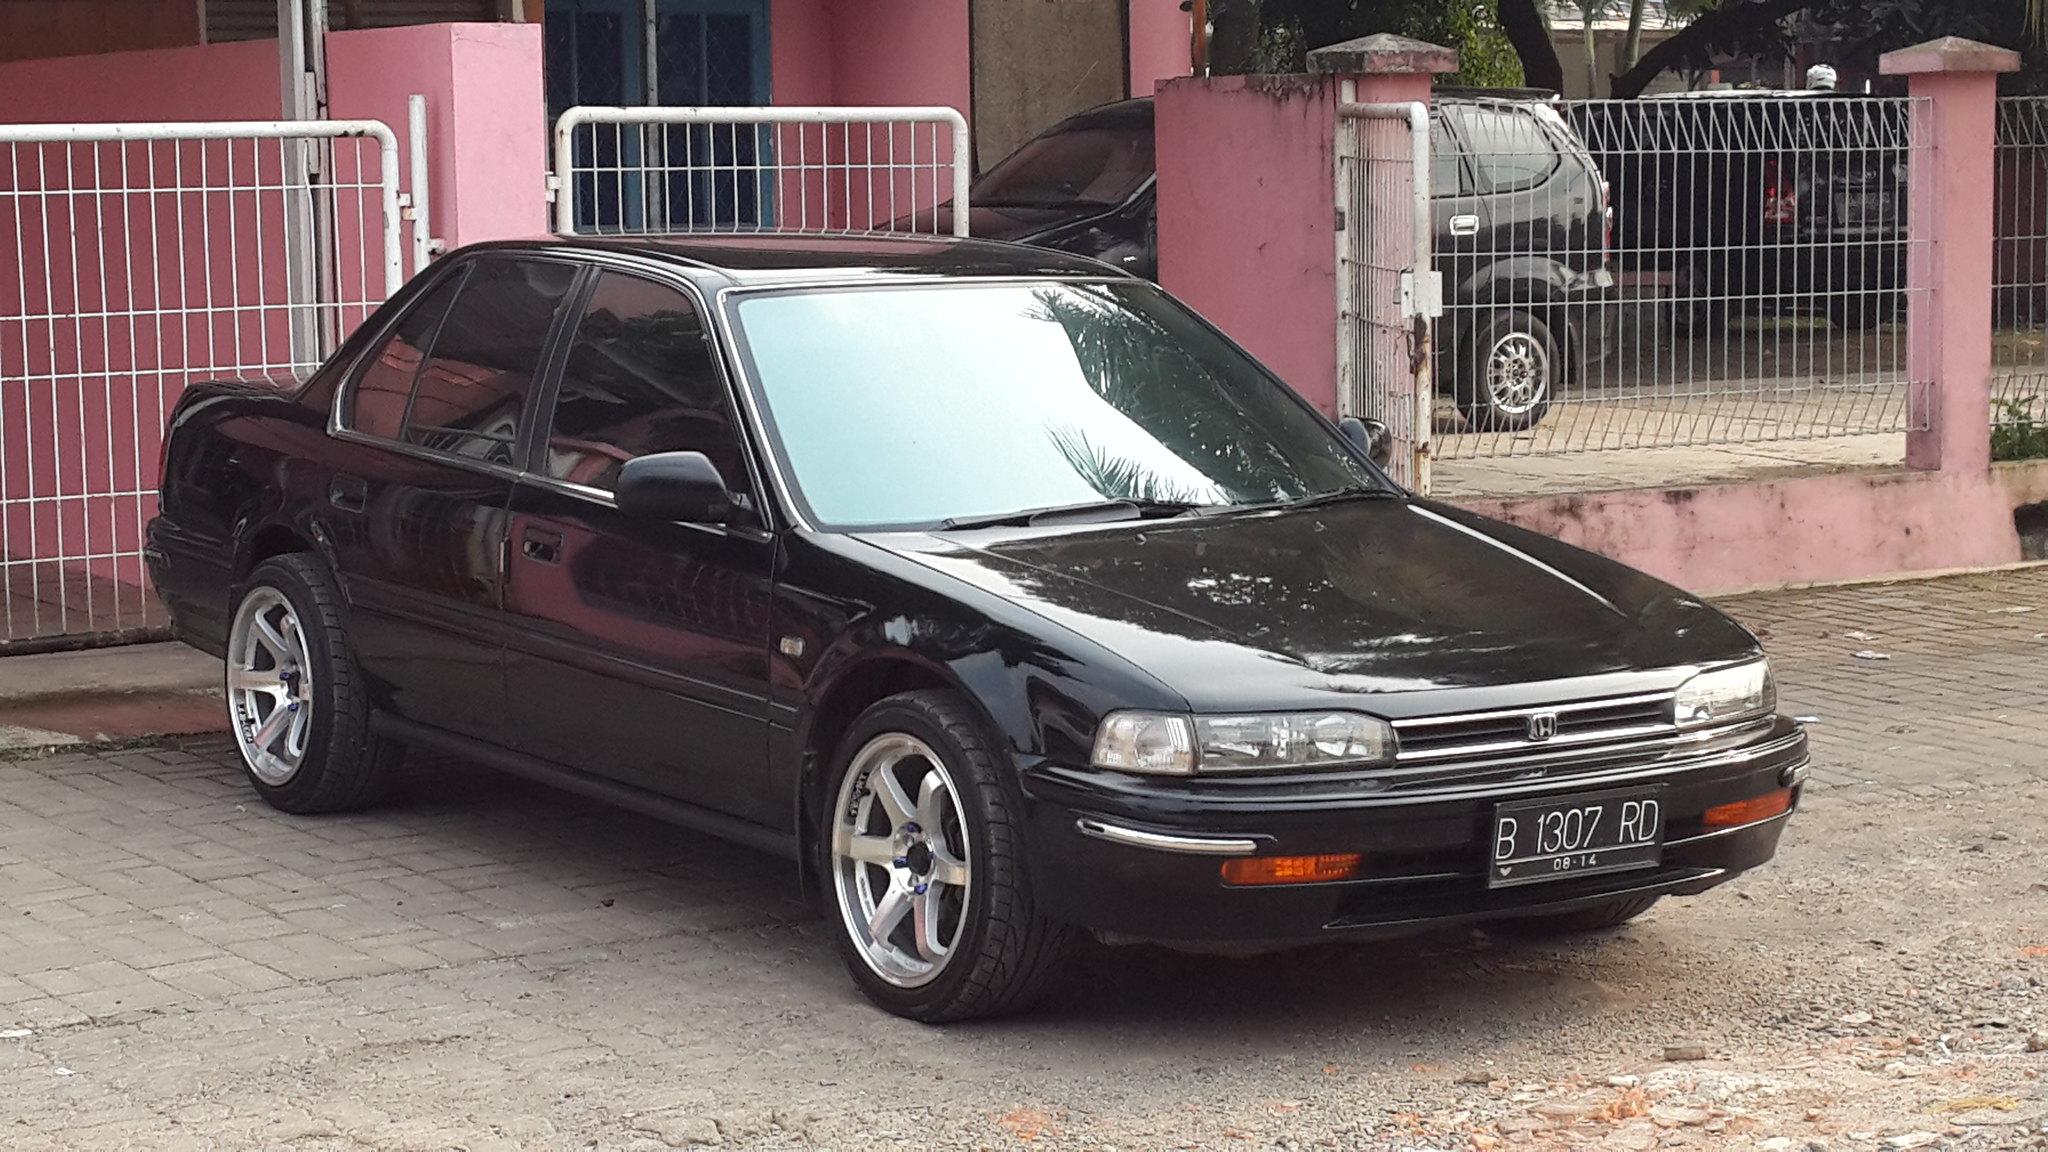 review honda accord maestro pgm-fi 1993 - serayamotor